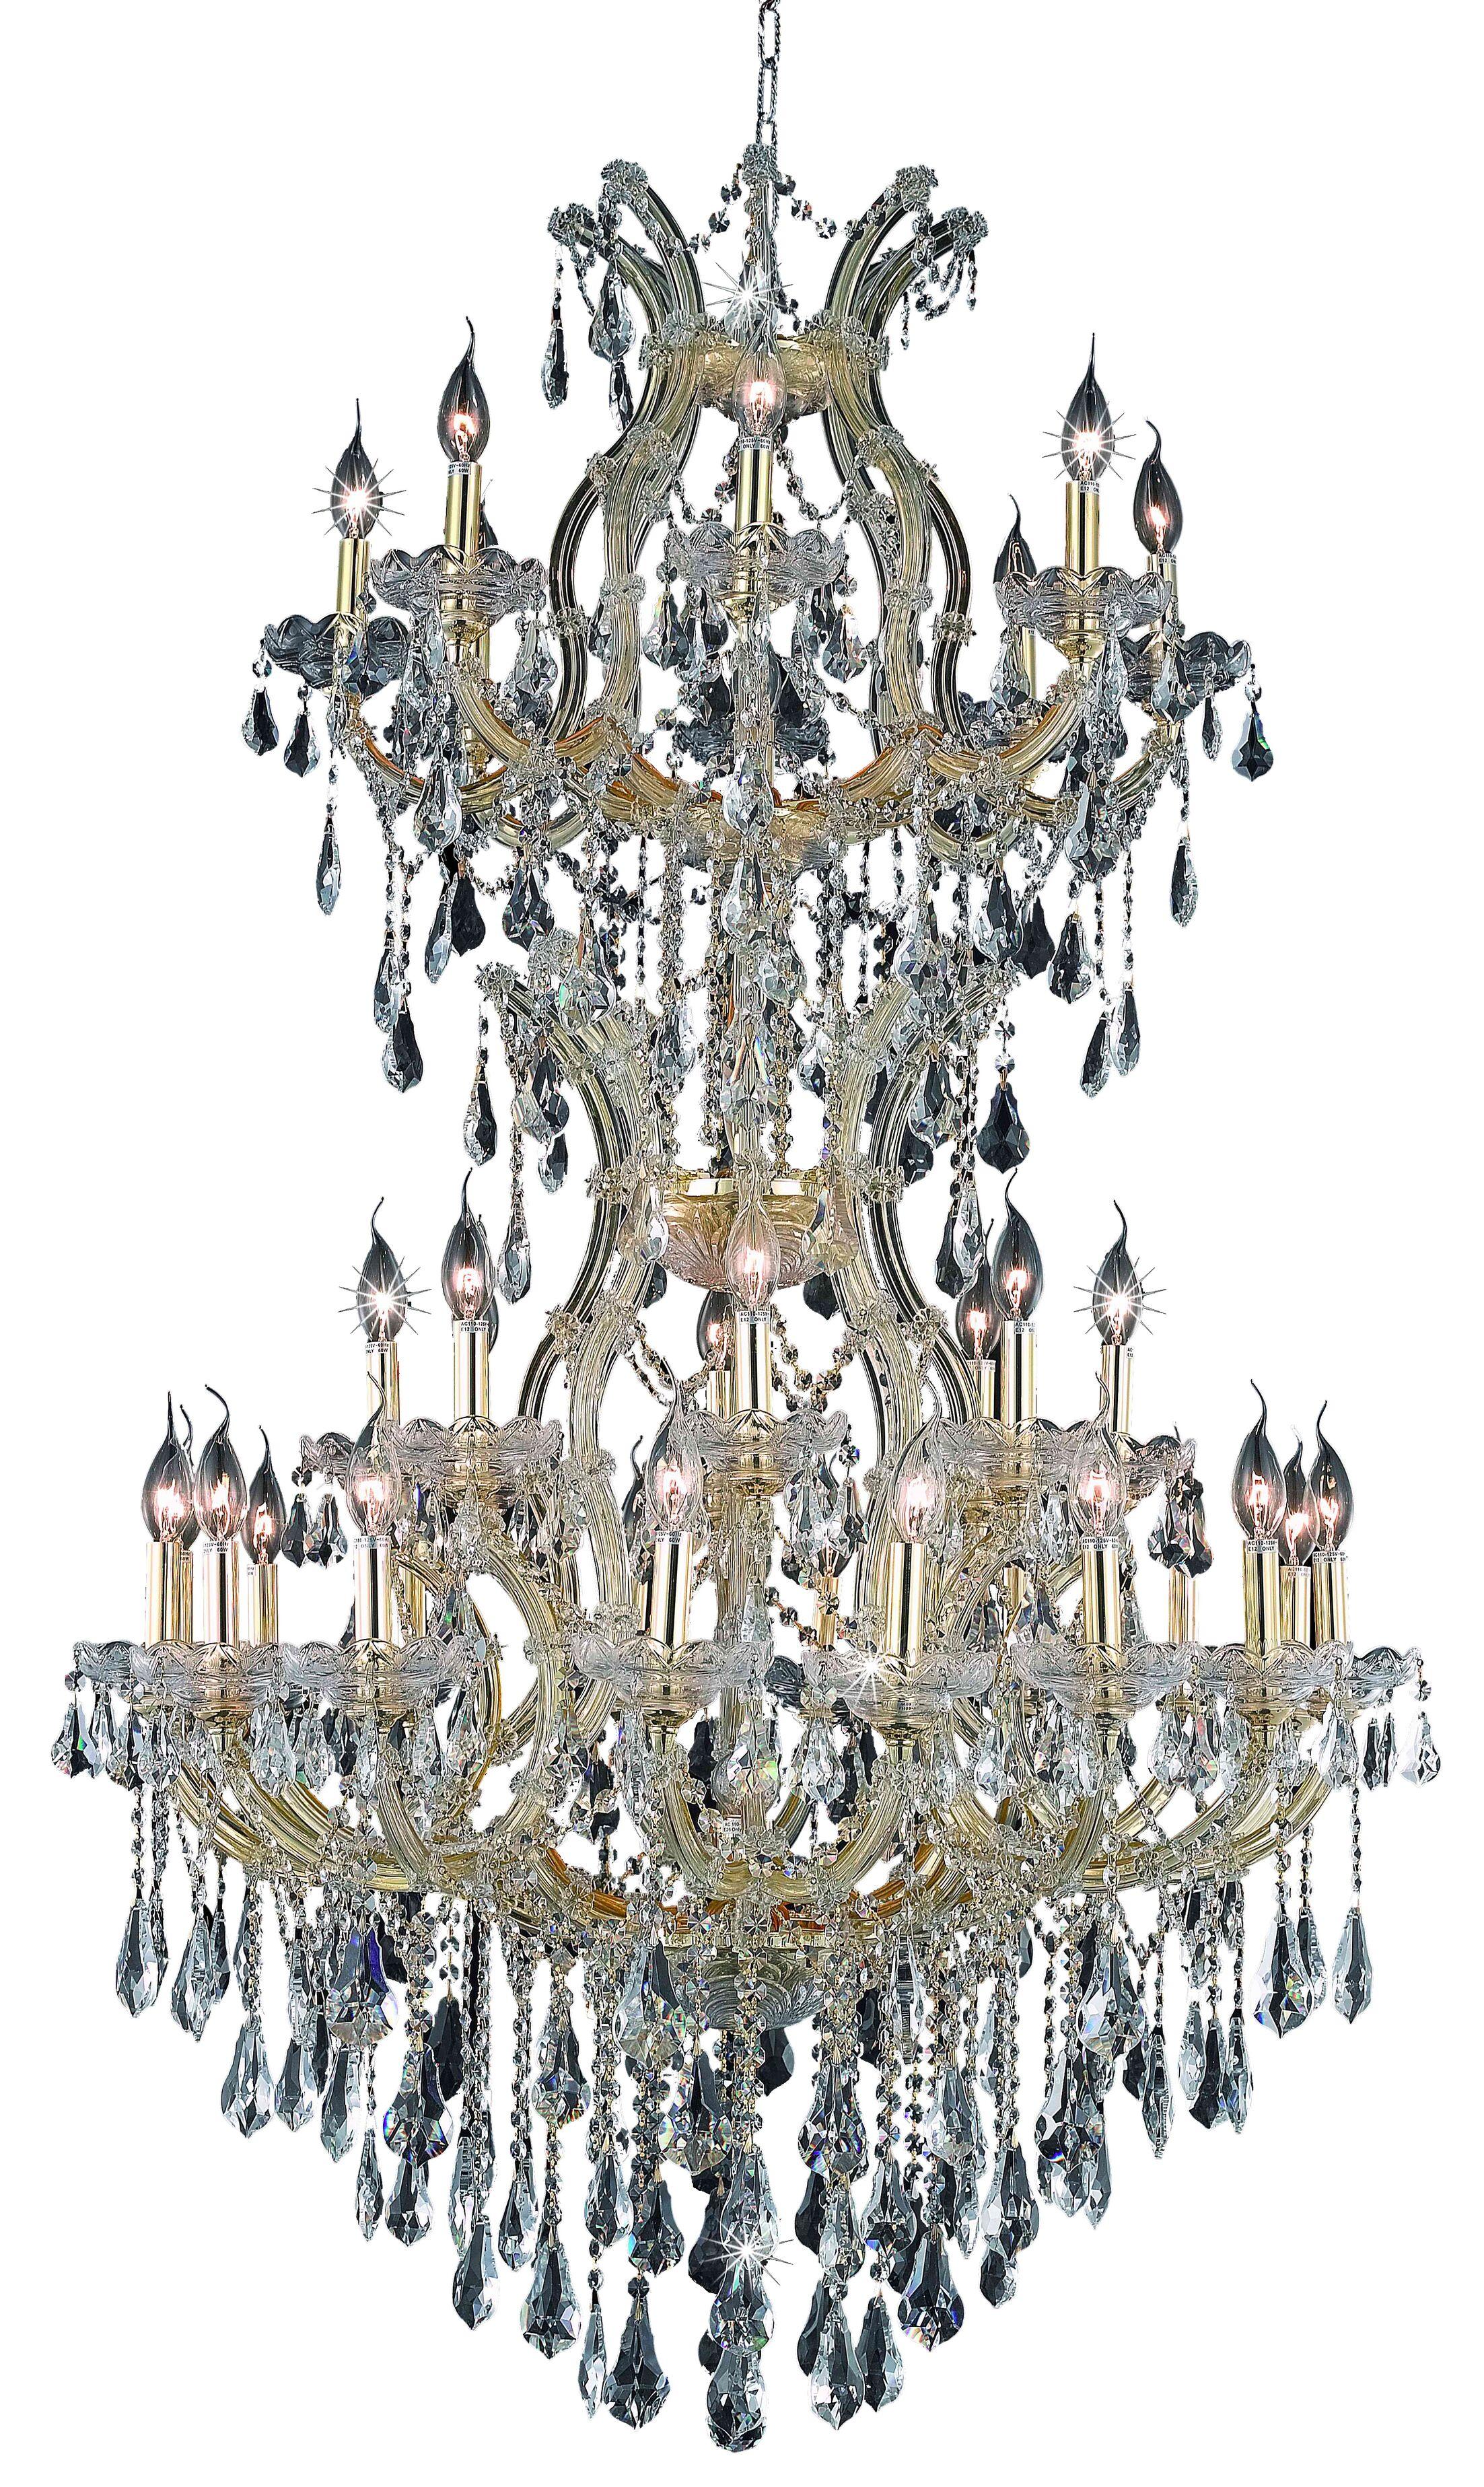 Regina 34-Light Royal Cut Candle Style Chandelier Finish / Crystal Finish / Crystal Trim: Gold / Golden Teak (Smoky) / Strass Swarovski